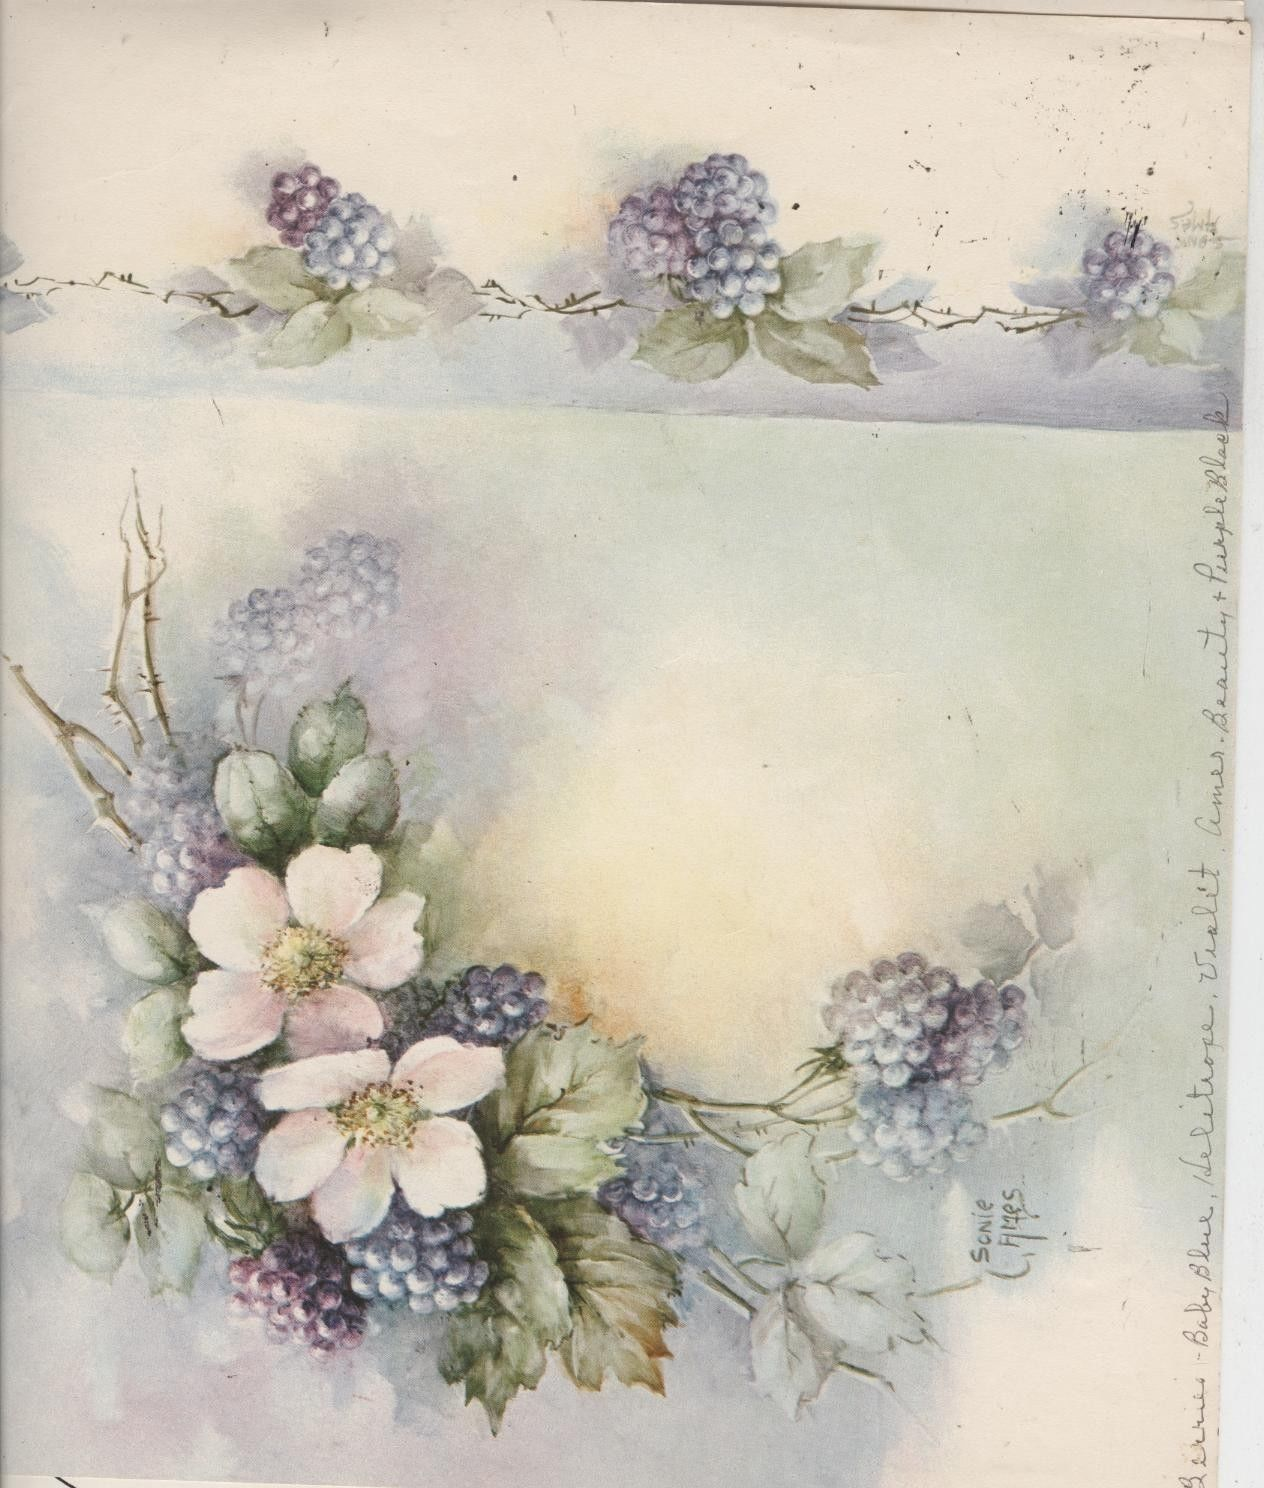 Blackberries Amp Wild Roses 49 By Sonie Ames China Painting